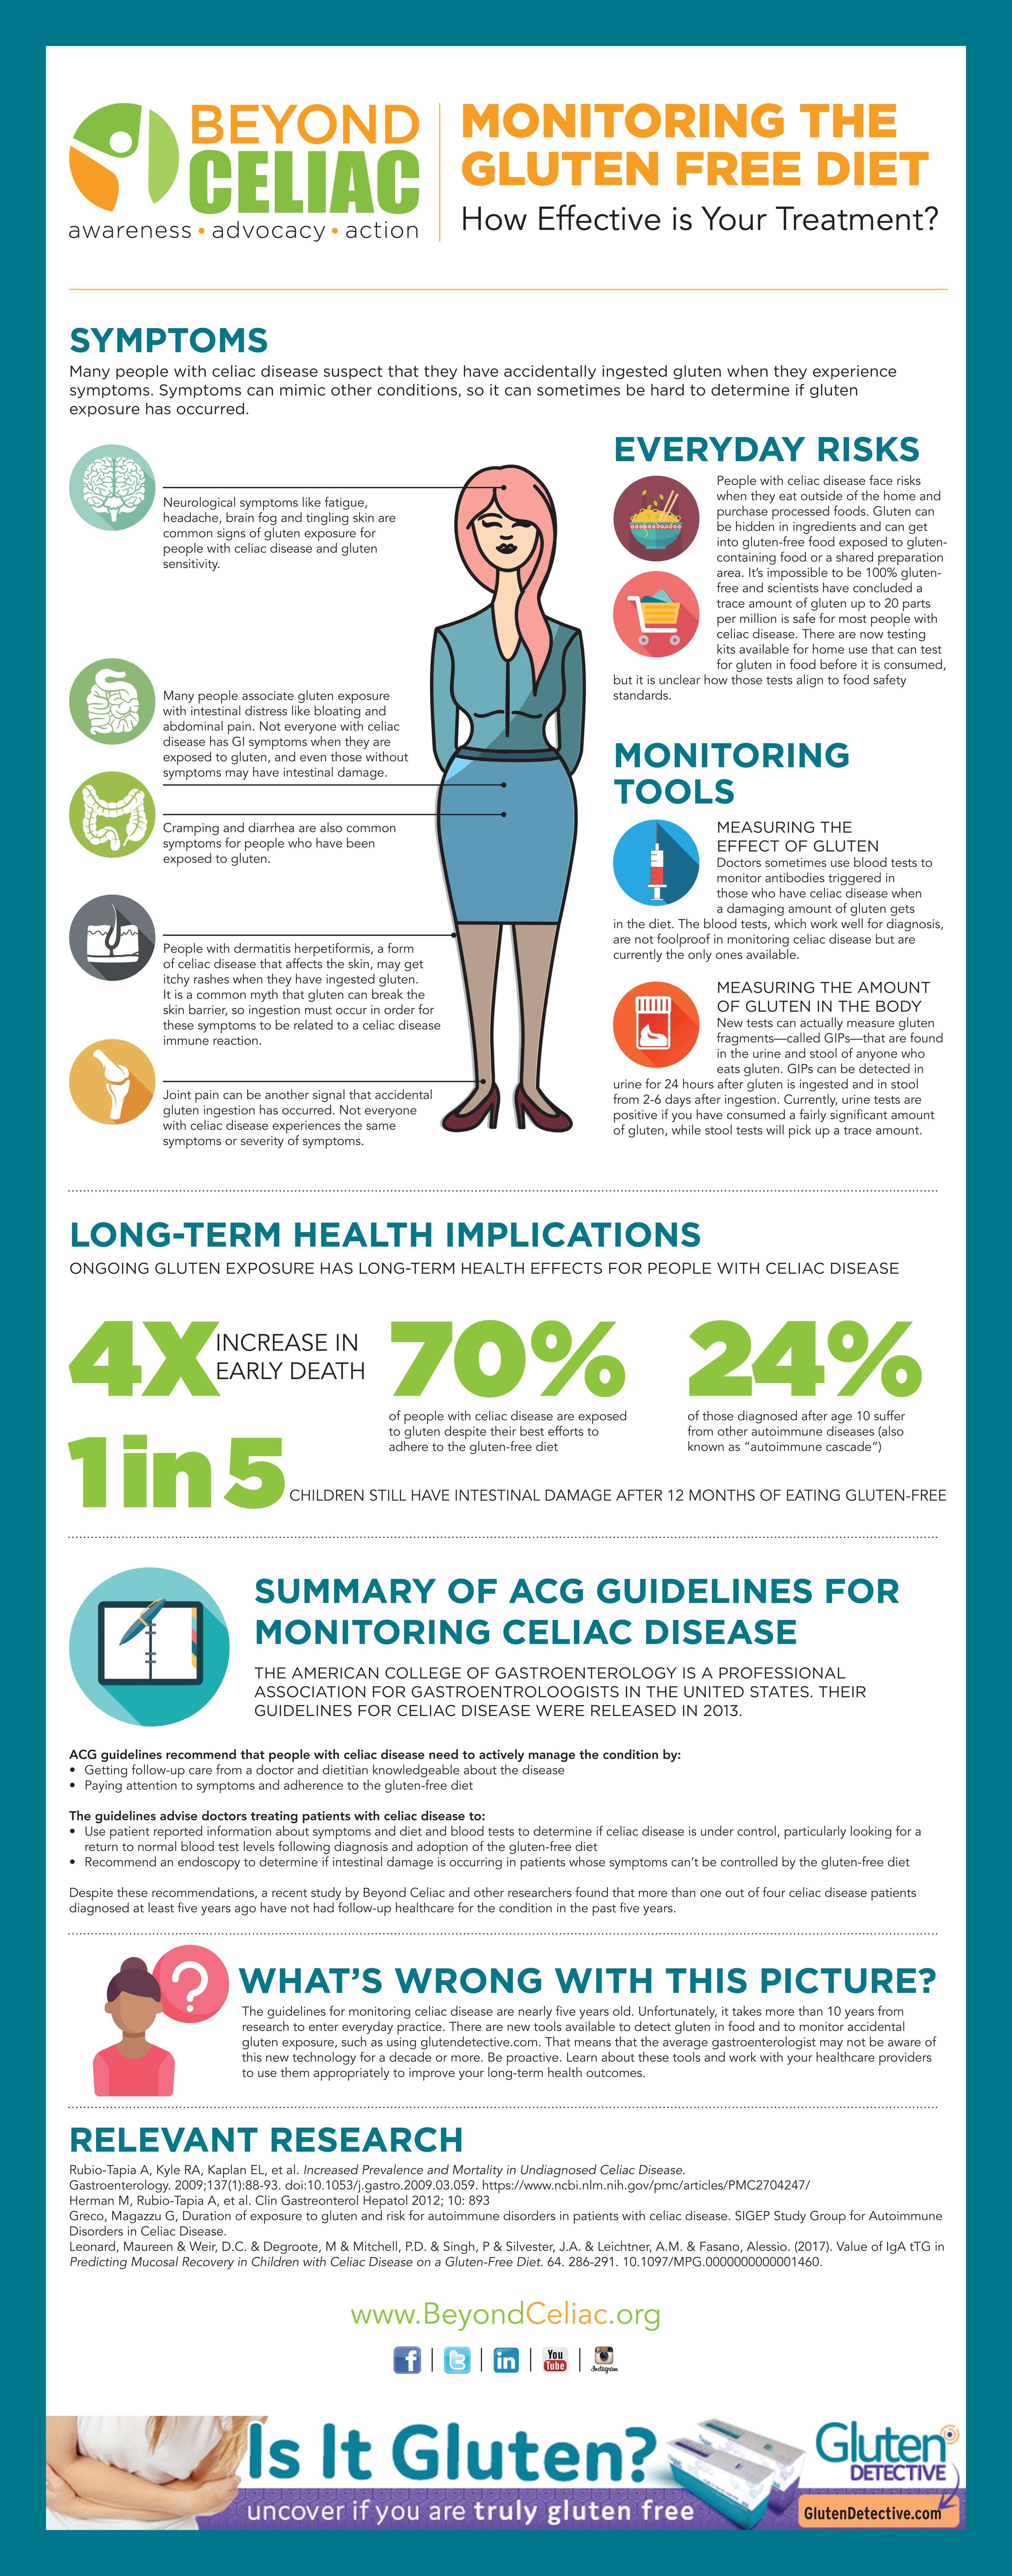 Celiac Disease Management & Monitoring | BeyondCeliac.org